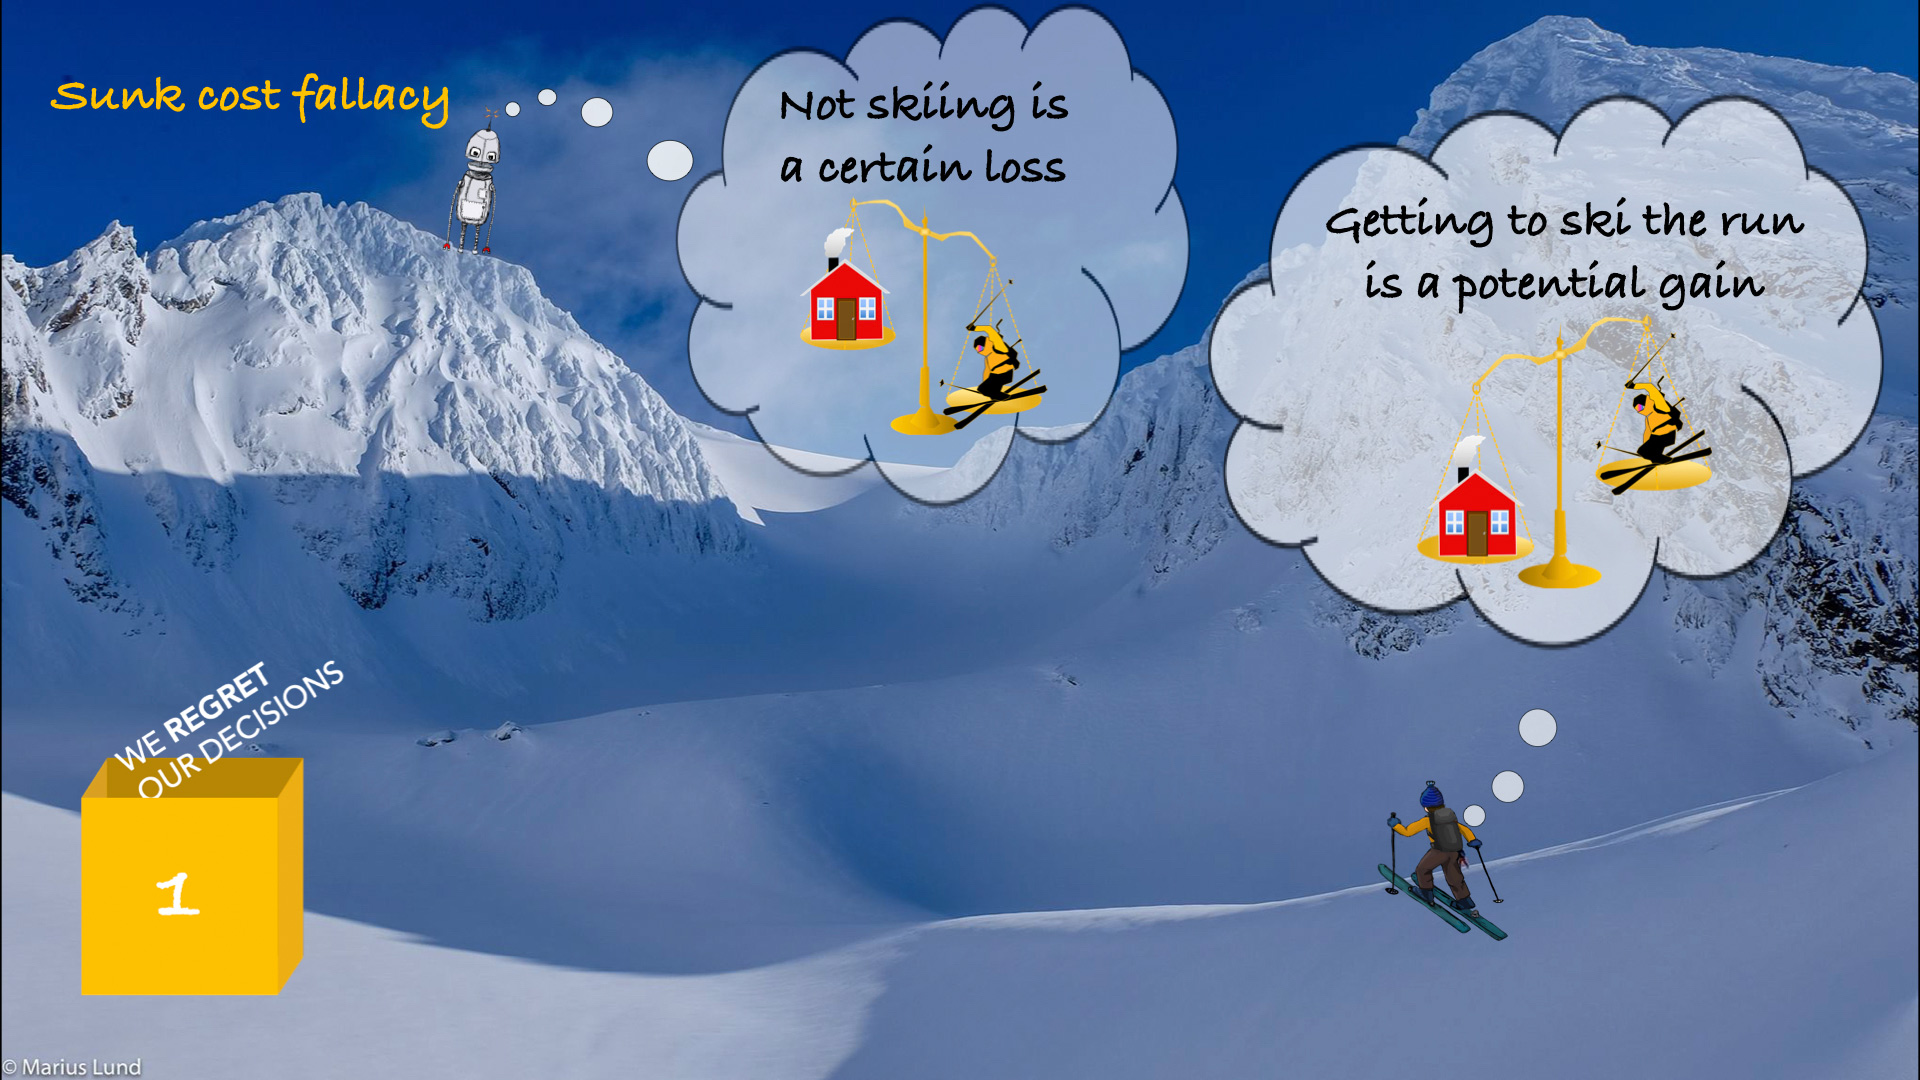 Slides: Andrea Mannberg, Marius Lund (UiT The Arctic University of Norway)